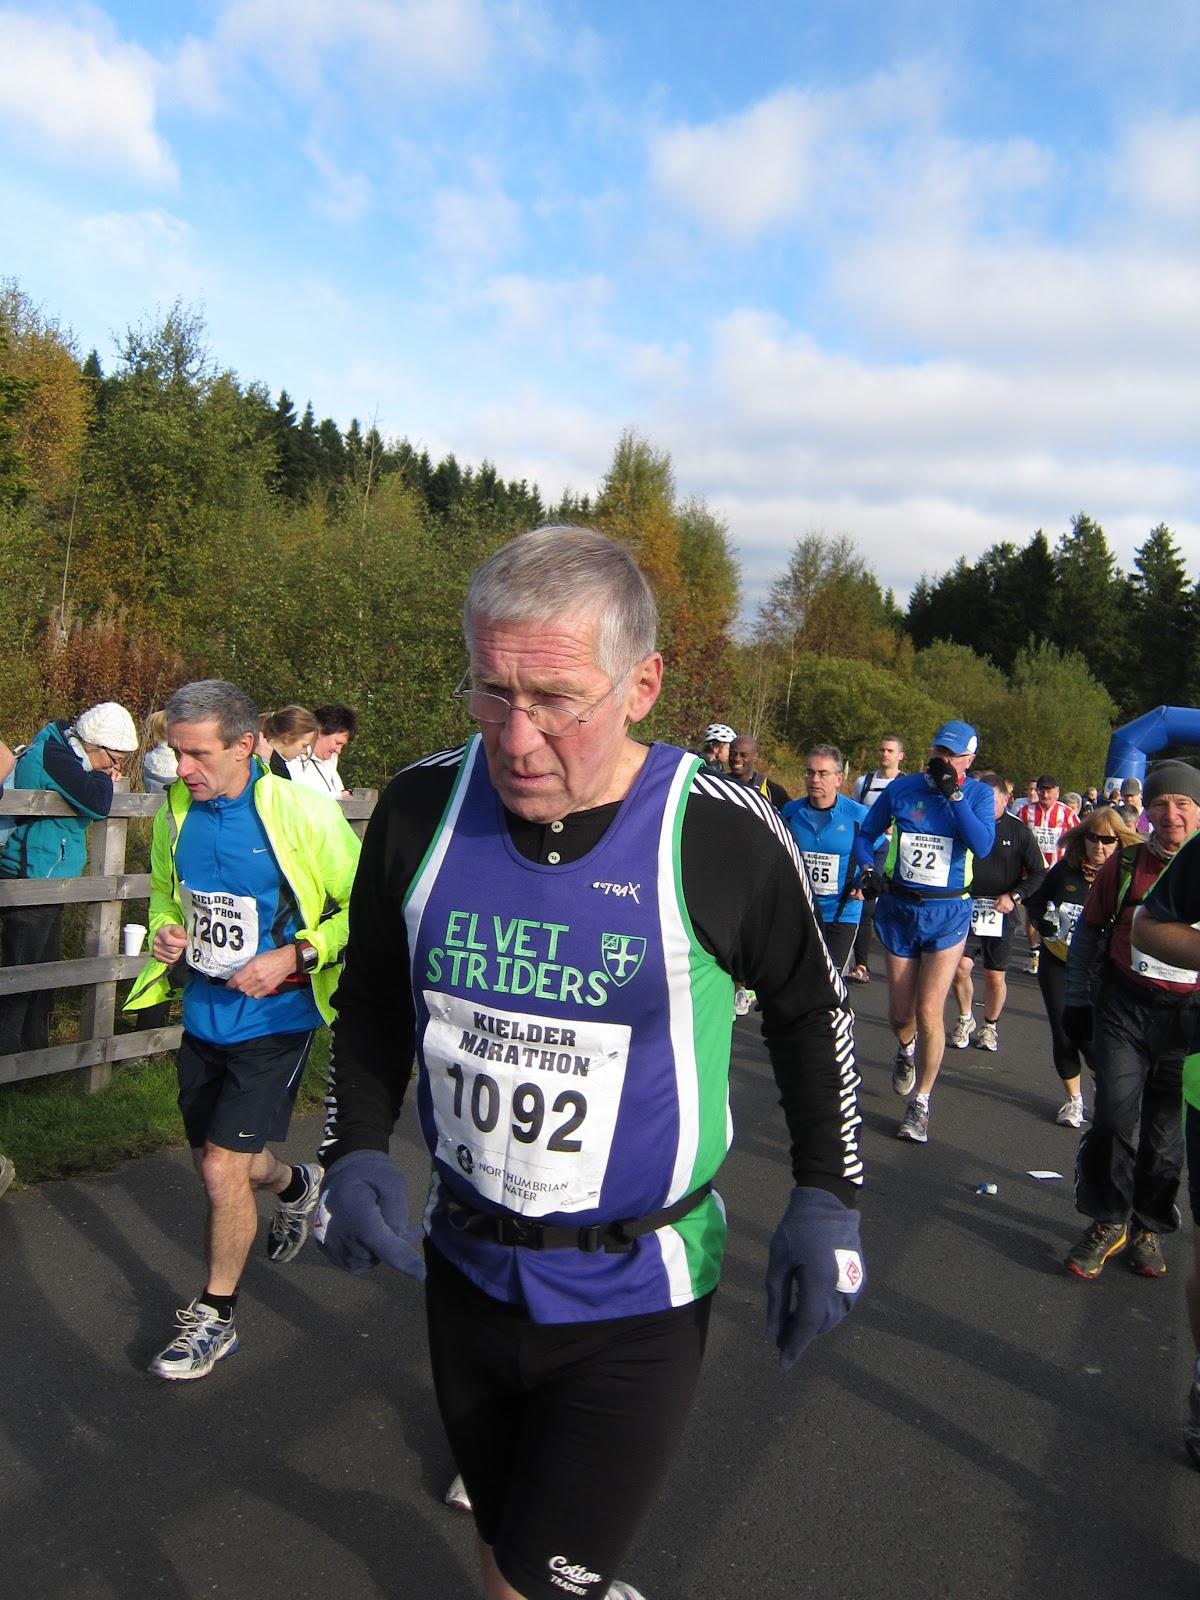 Kielder -- Alan Purvis -- Kielder Marathon - 2010 -- (United Kingdom - England - Falstone - Falstone) -- Sun 17 Oct 2010 10-20-52 BST.jpg